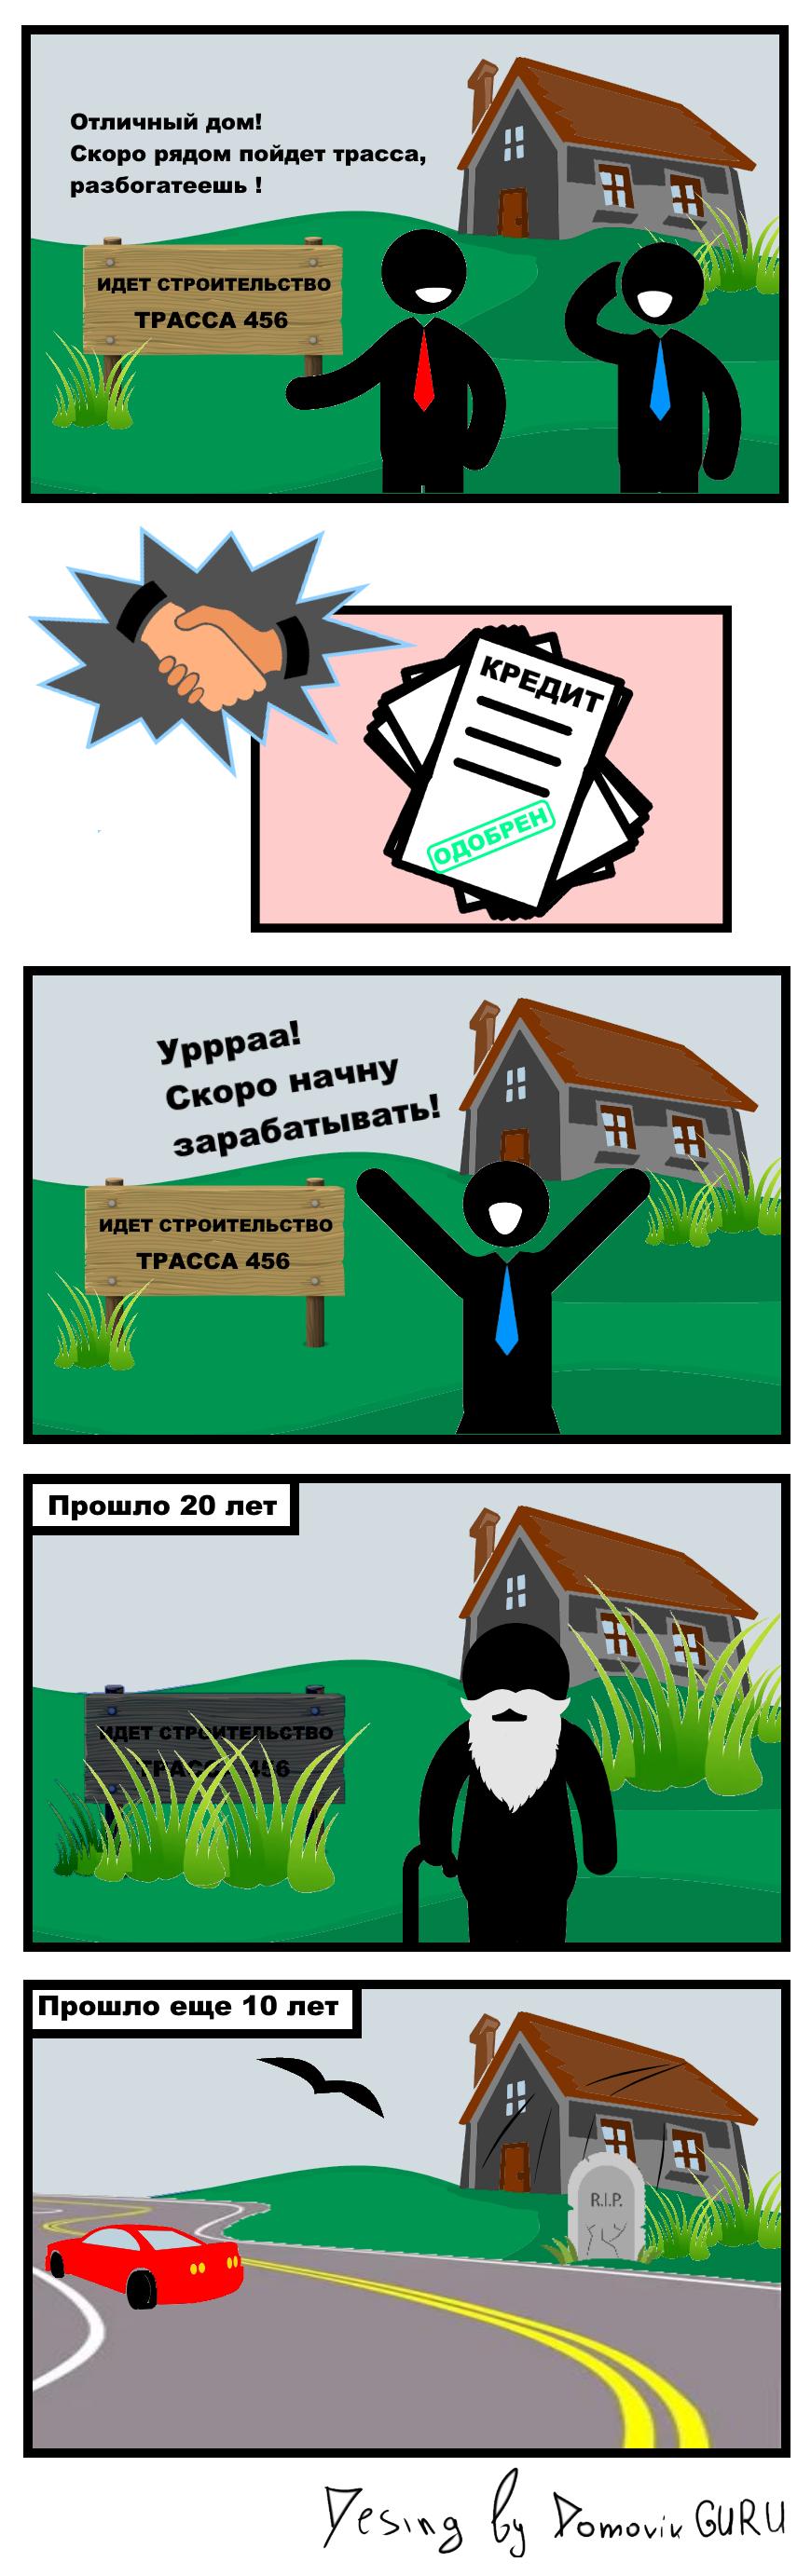 Быстрые деньги - комиксы домовик.гуру